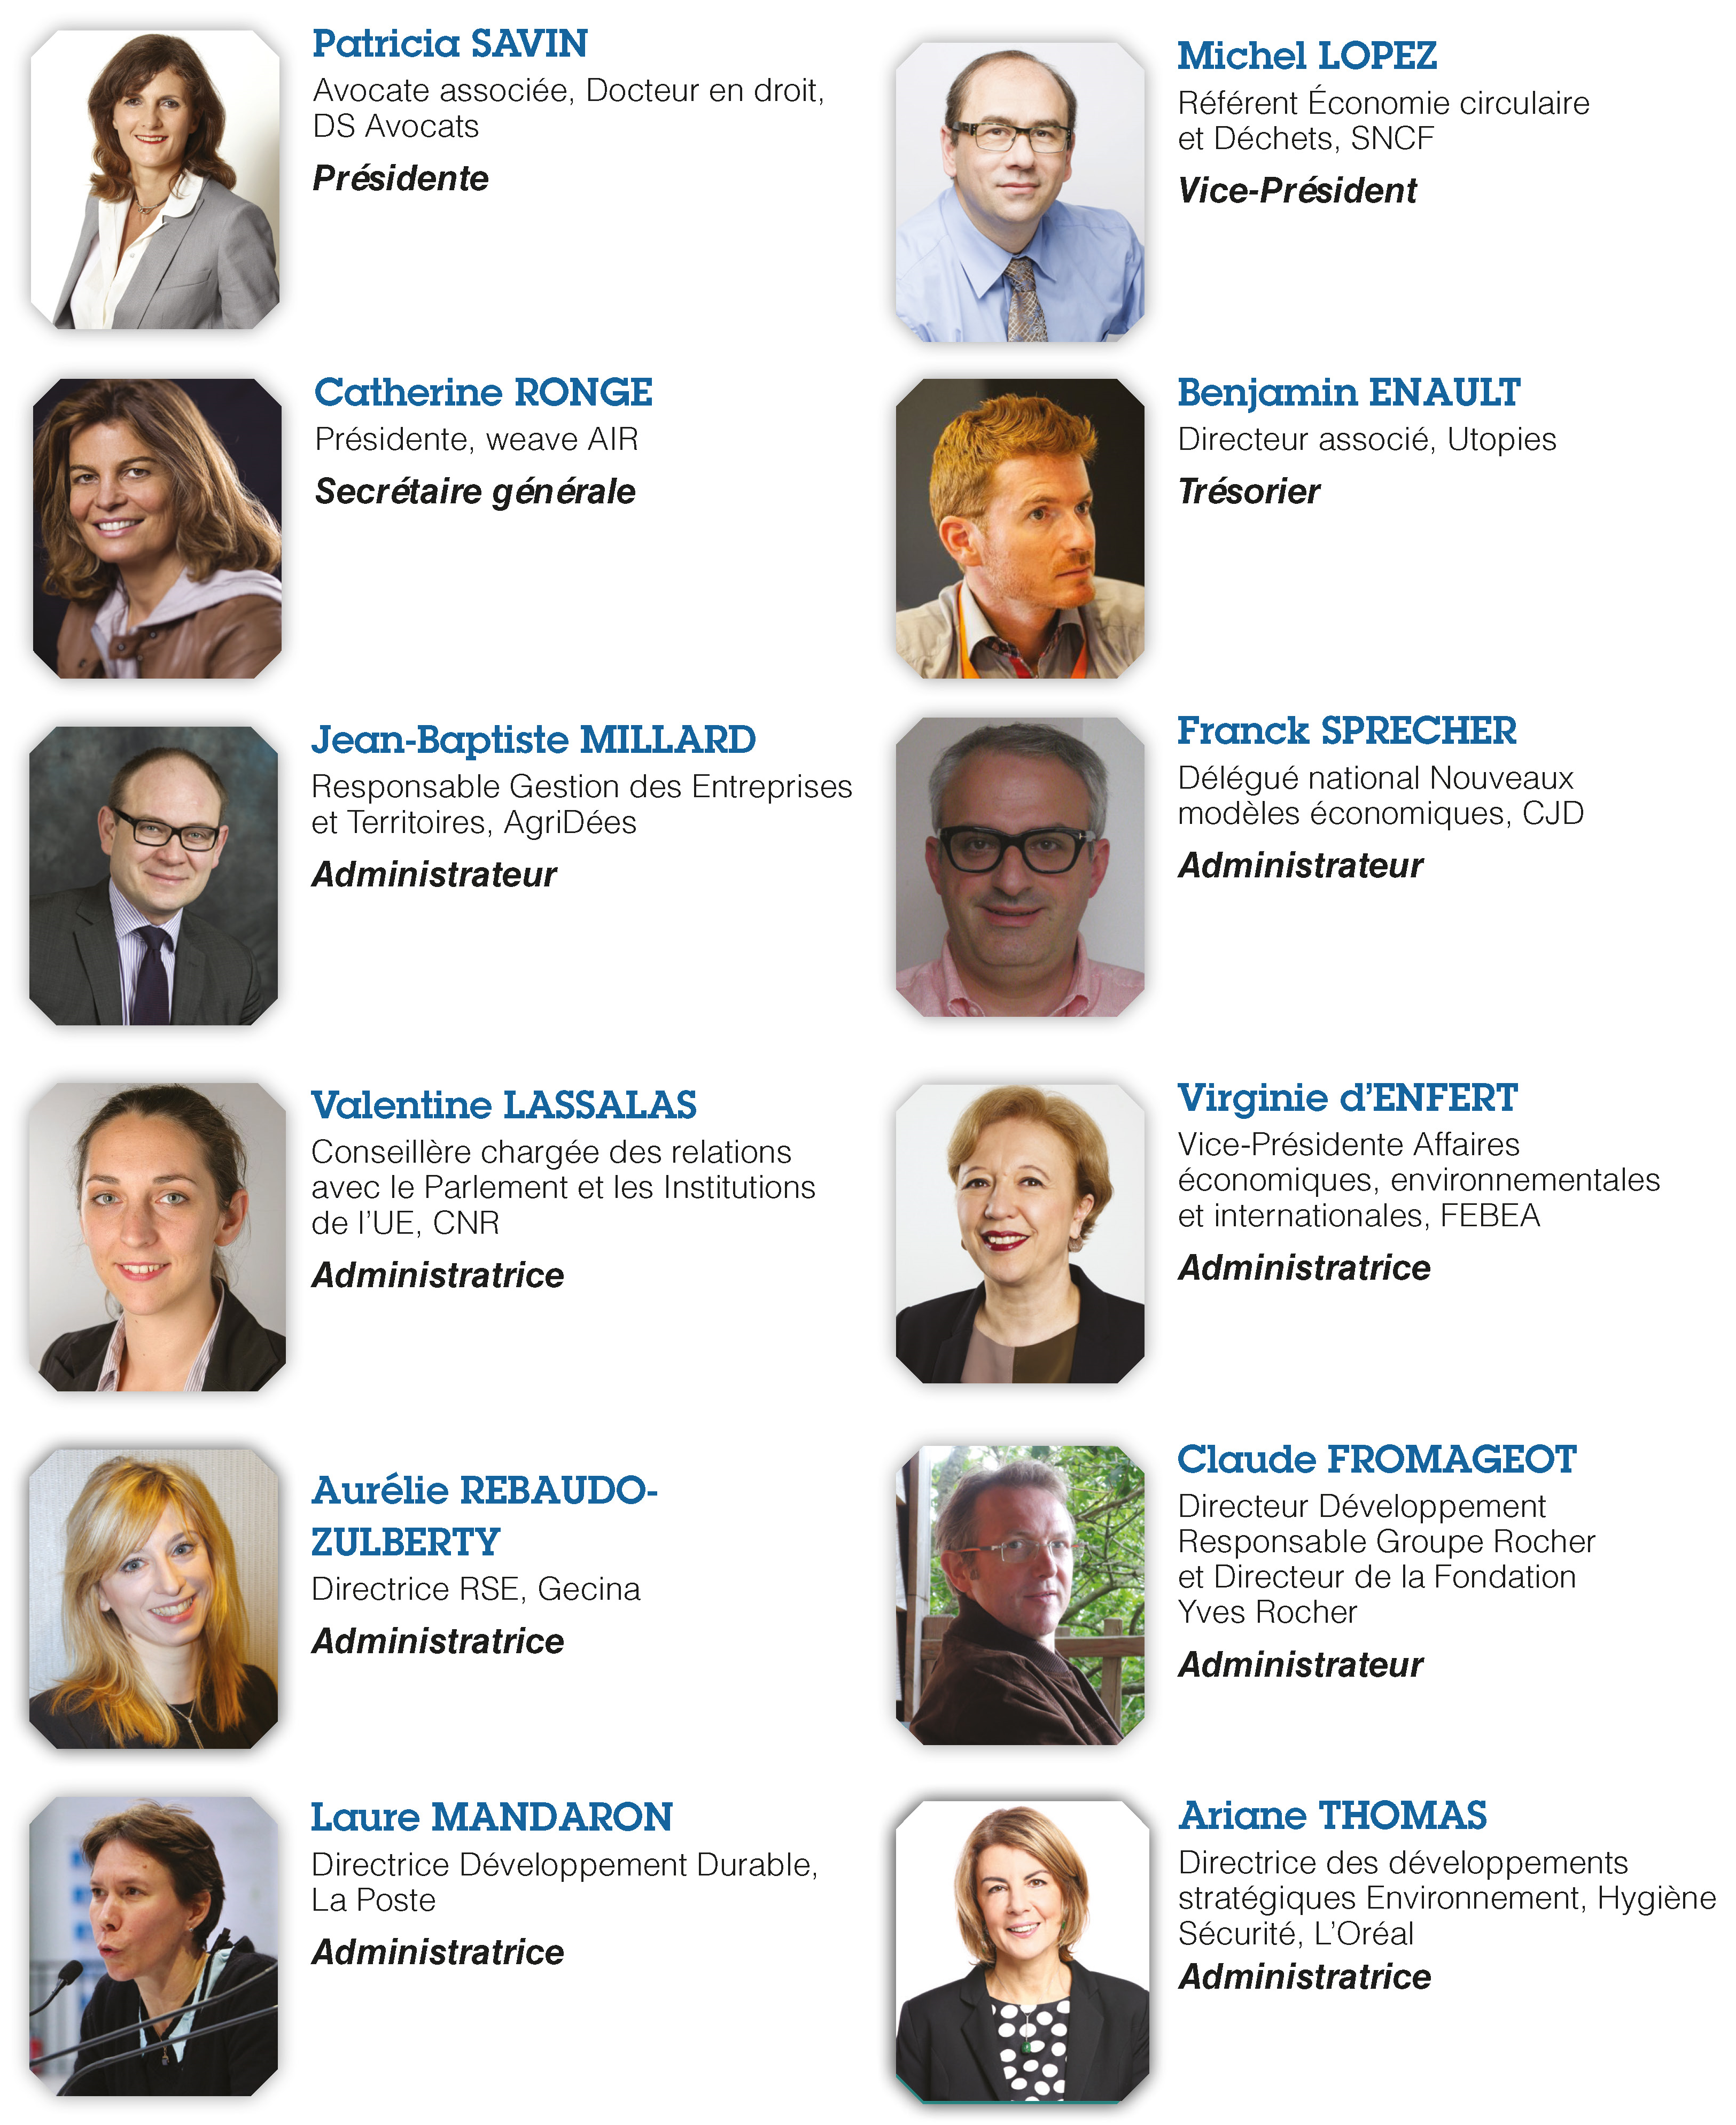 Conseil d'administration OREE 2017